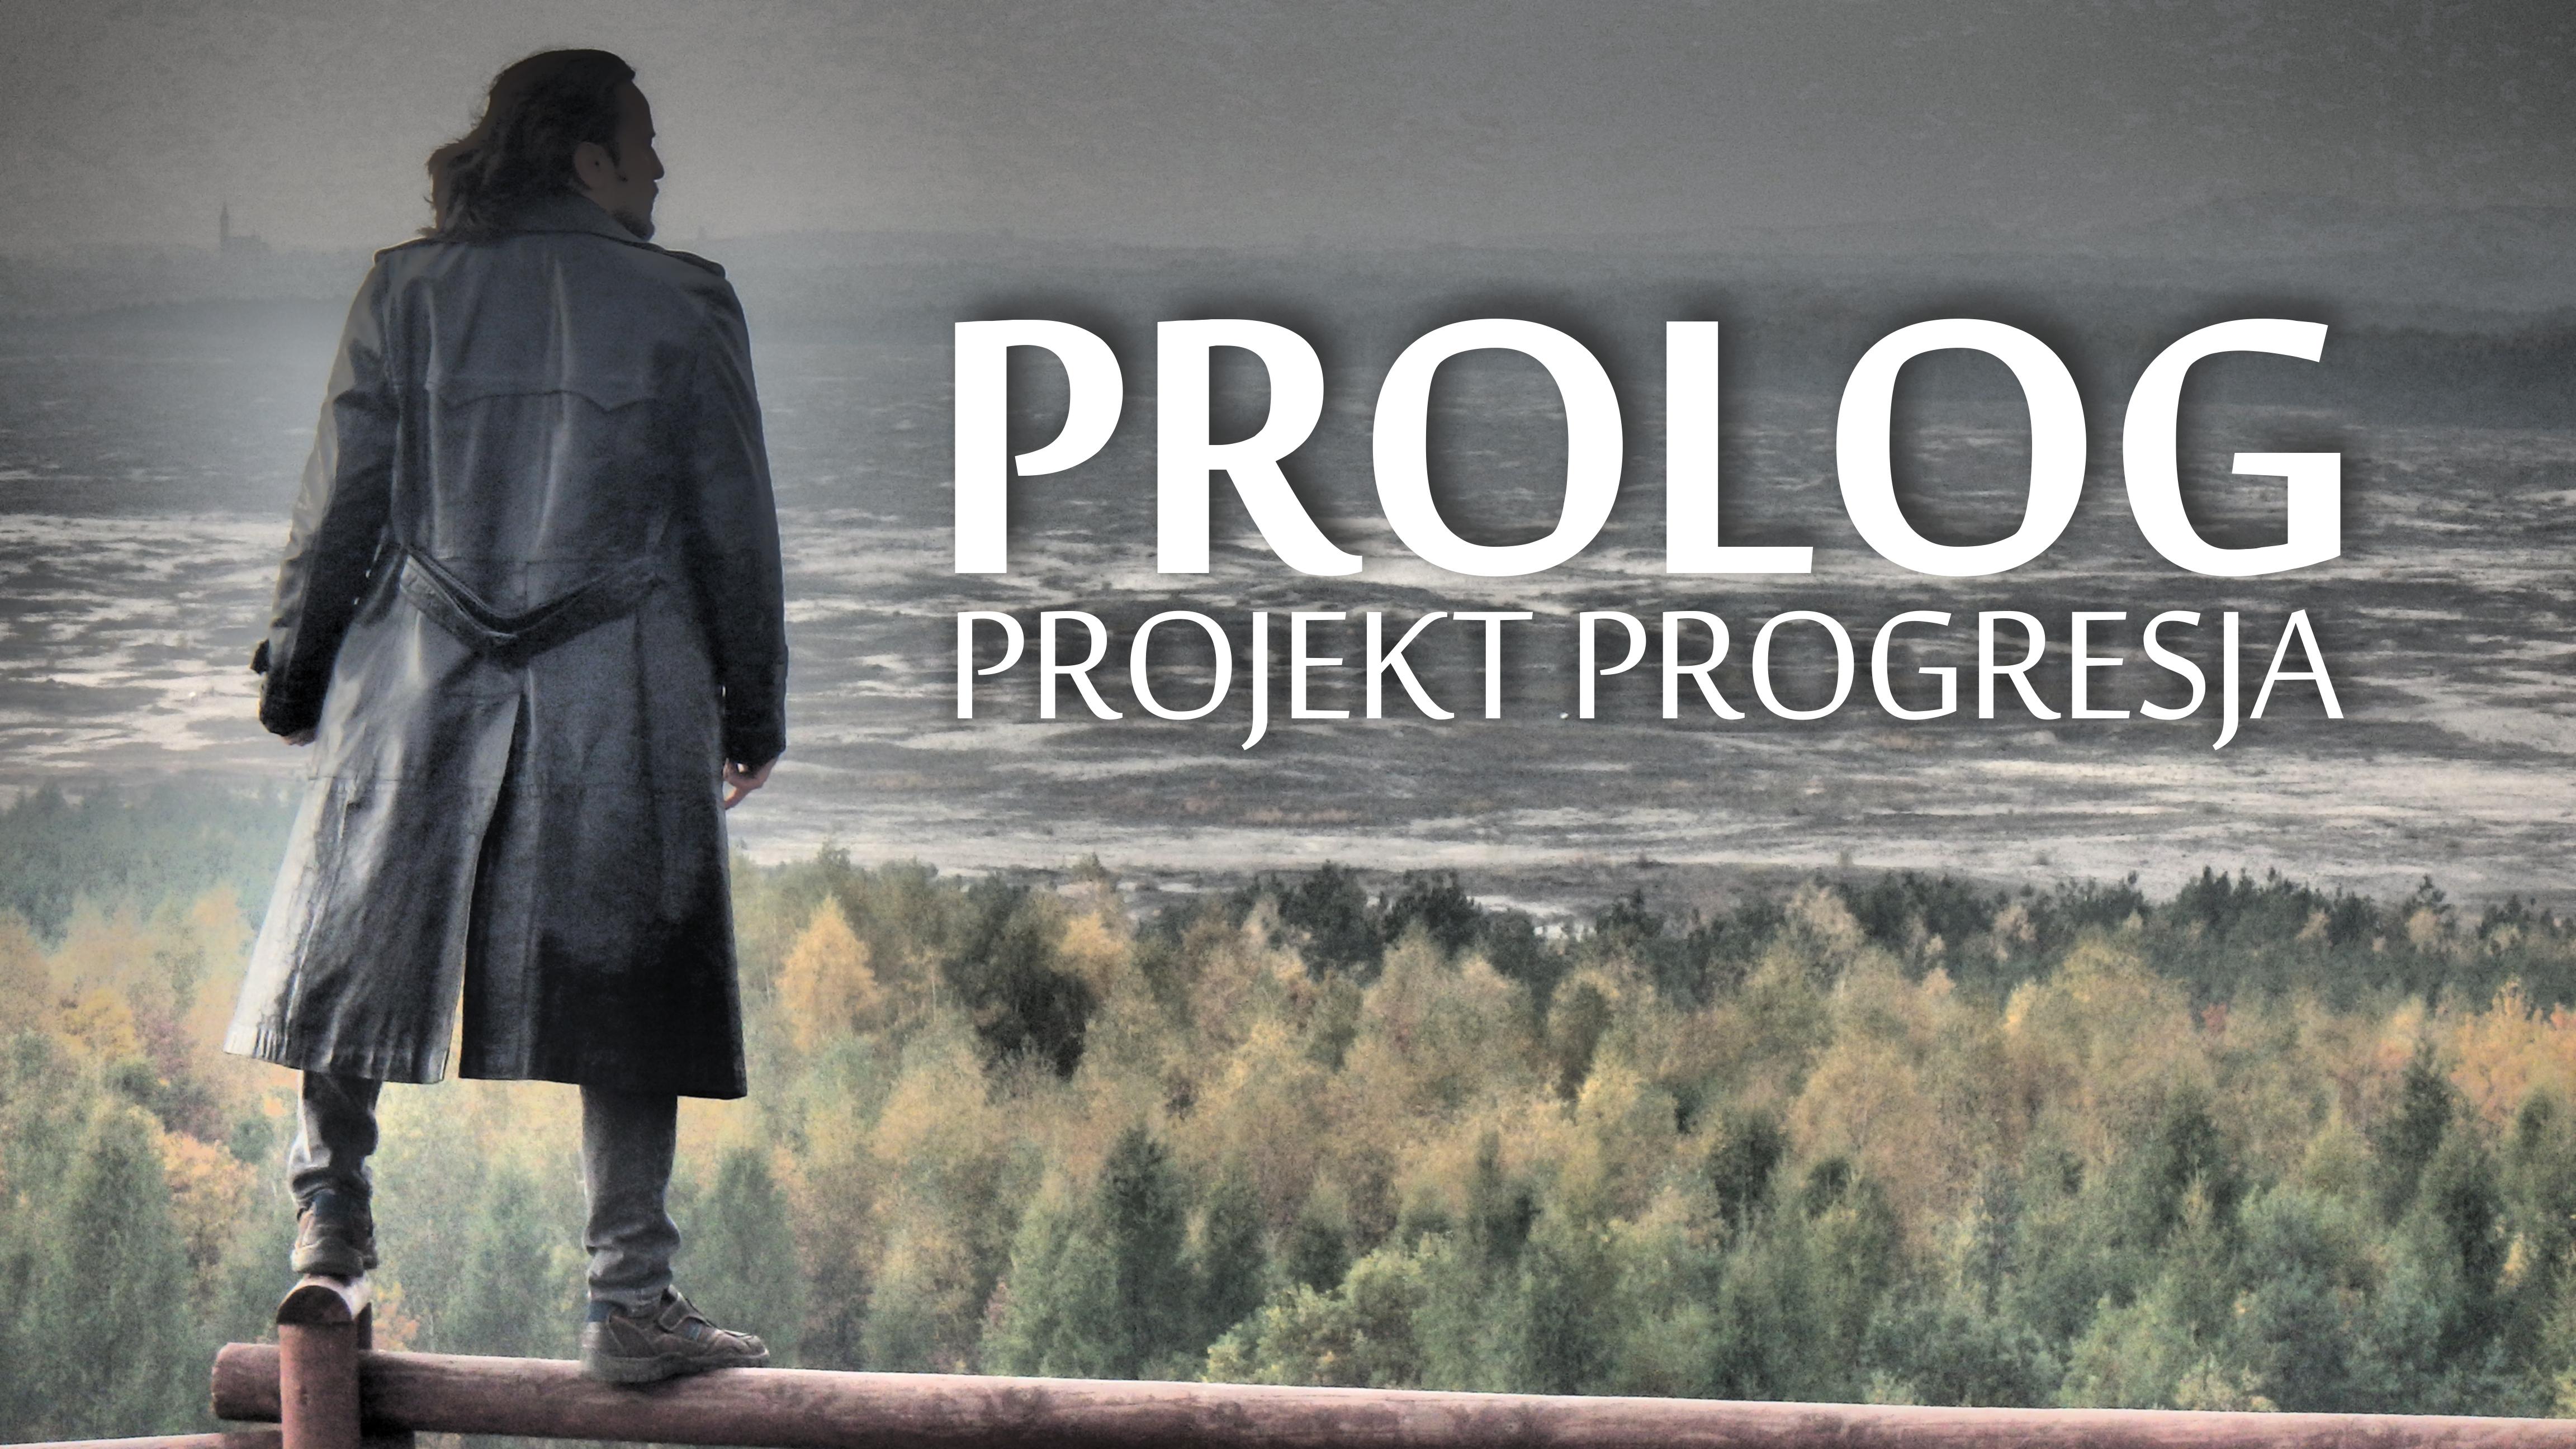 projekt progresja - prolog